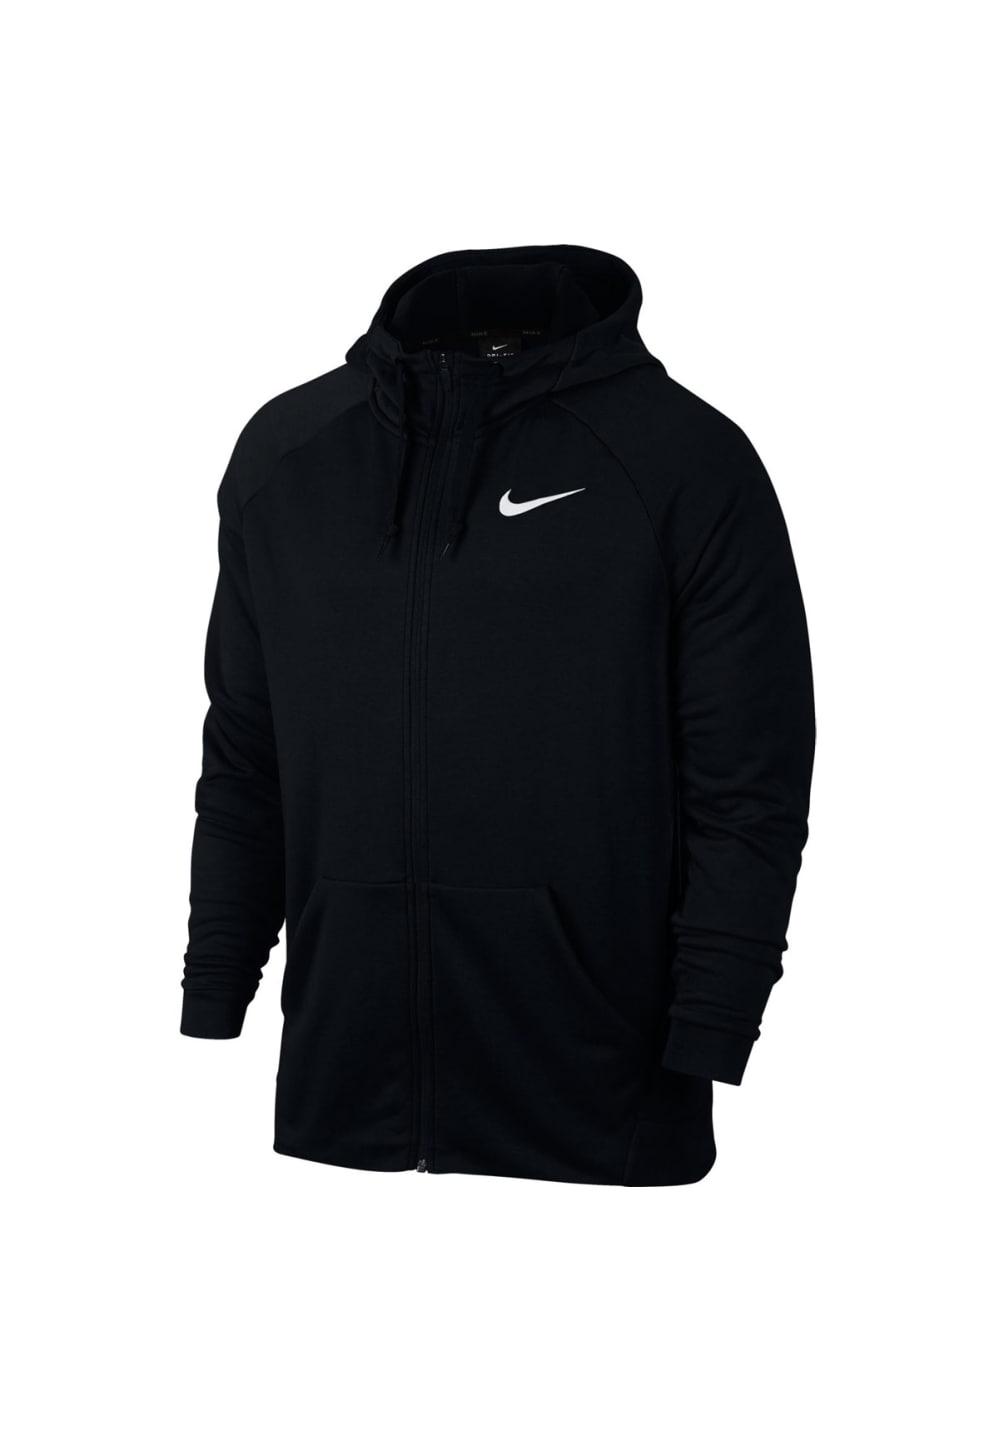 nike dry training hoodie sweatshirts hoodies f r. Black Bedroom Furniture Sets. Home Design Ideas